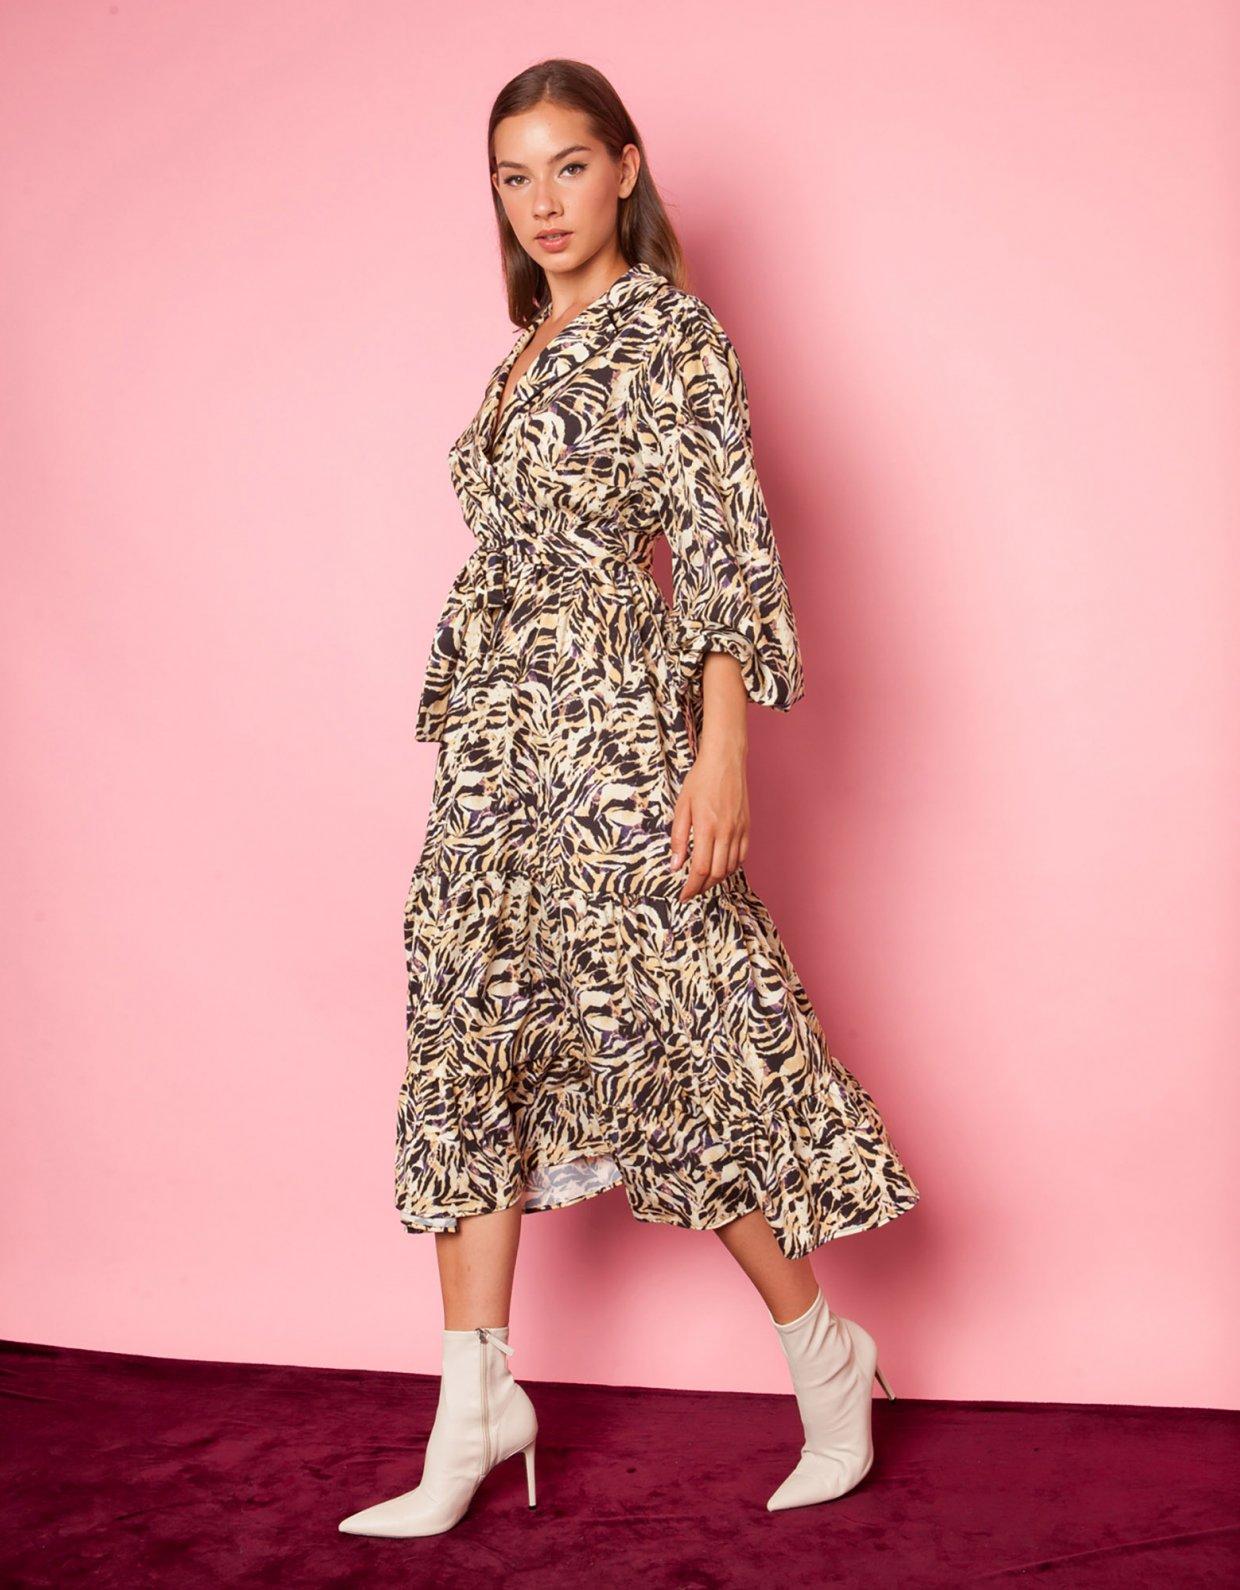 Mallory the label Dahlia zebra dress